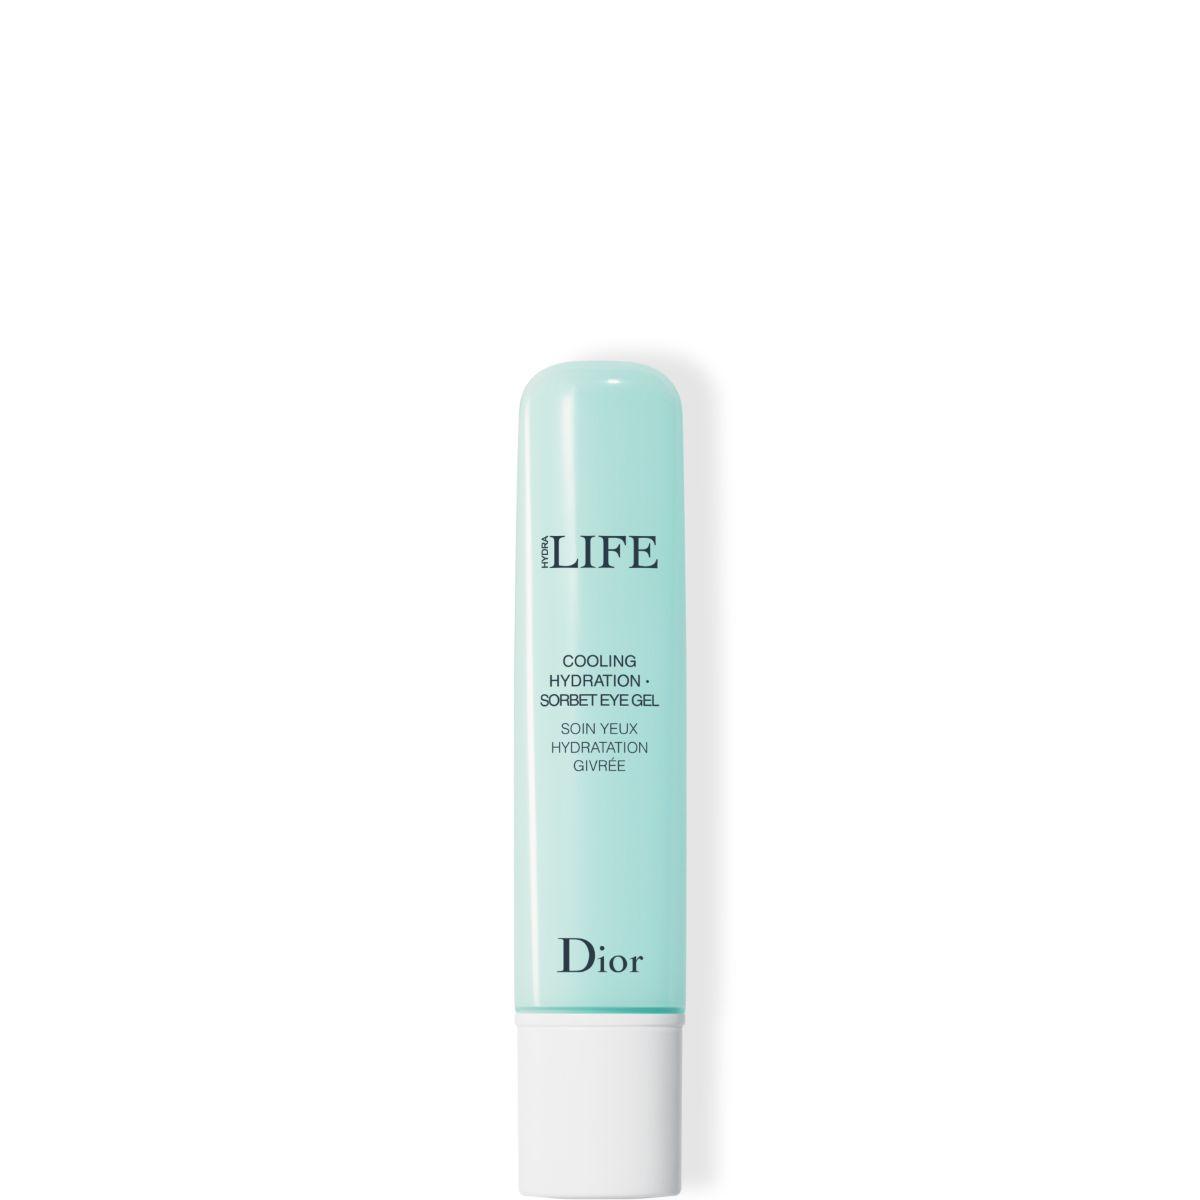 Dior - Hydra Life - Soin Yeux Hydratation Givrée - 15 ml